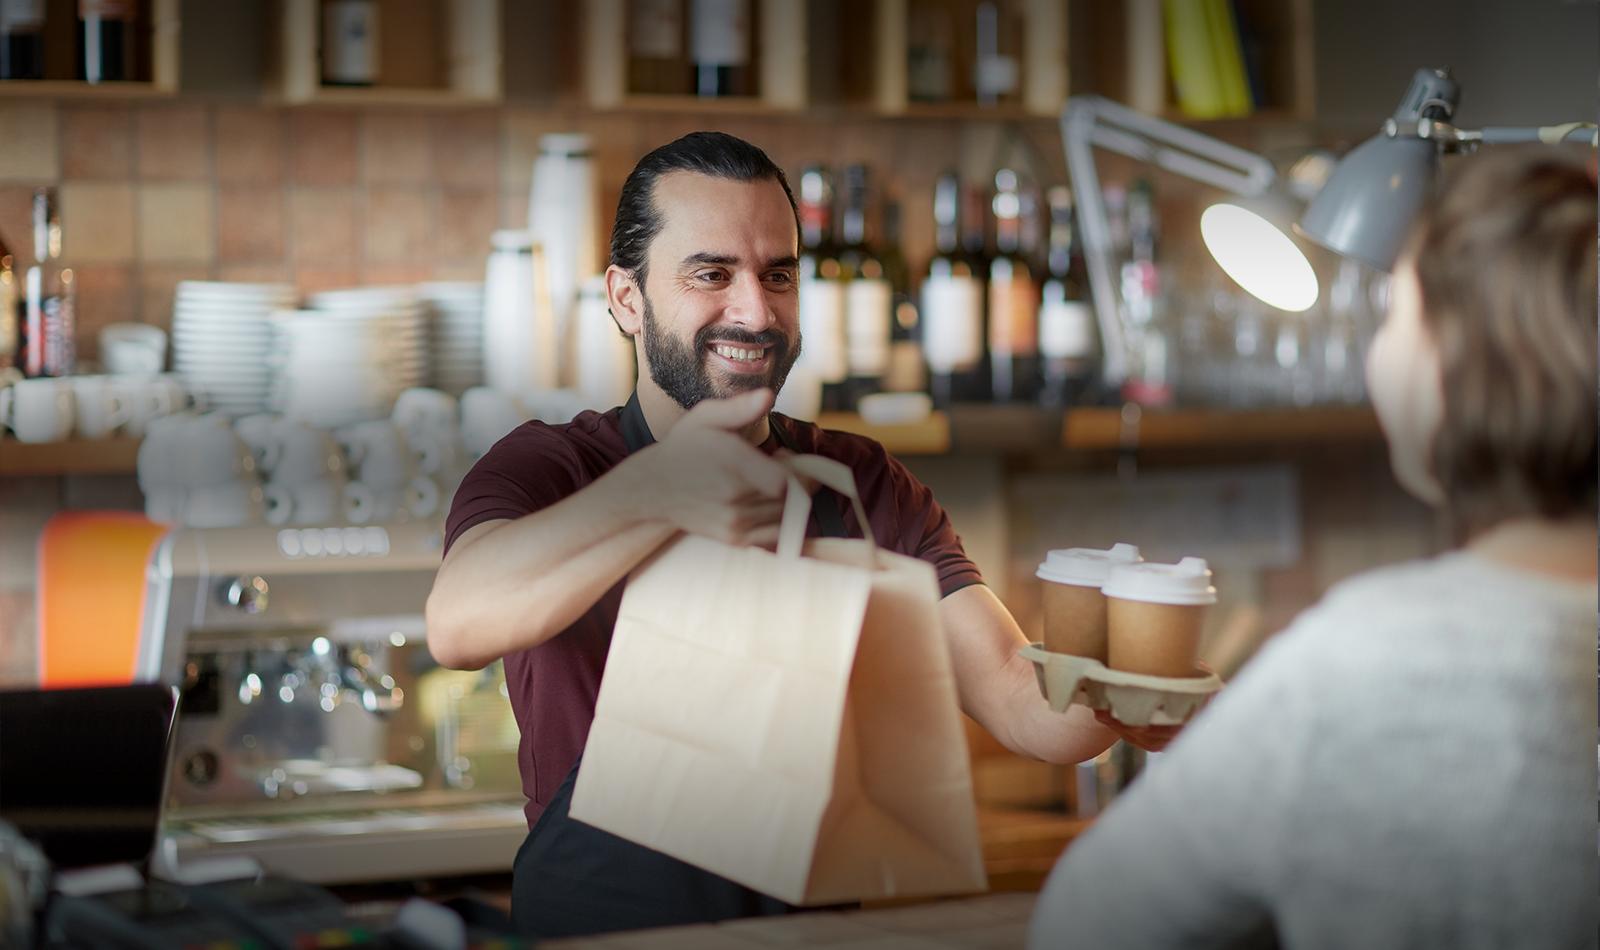 Man serving customer at coffee shop